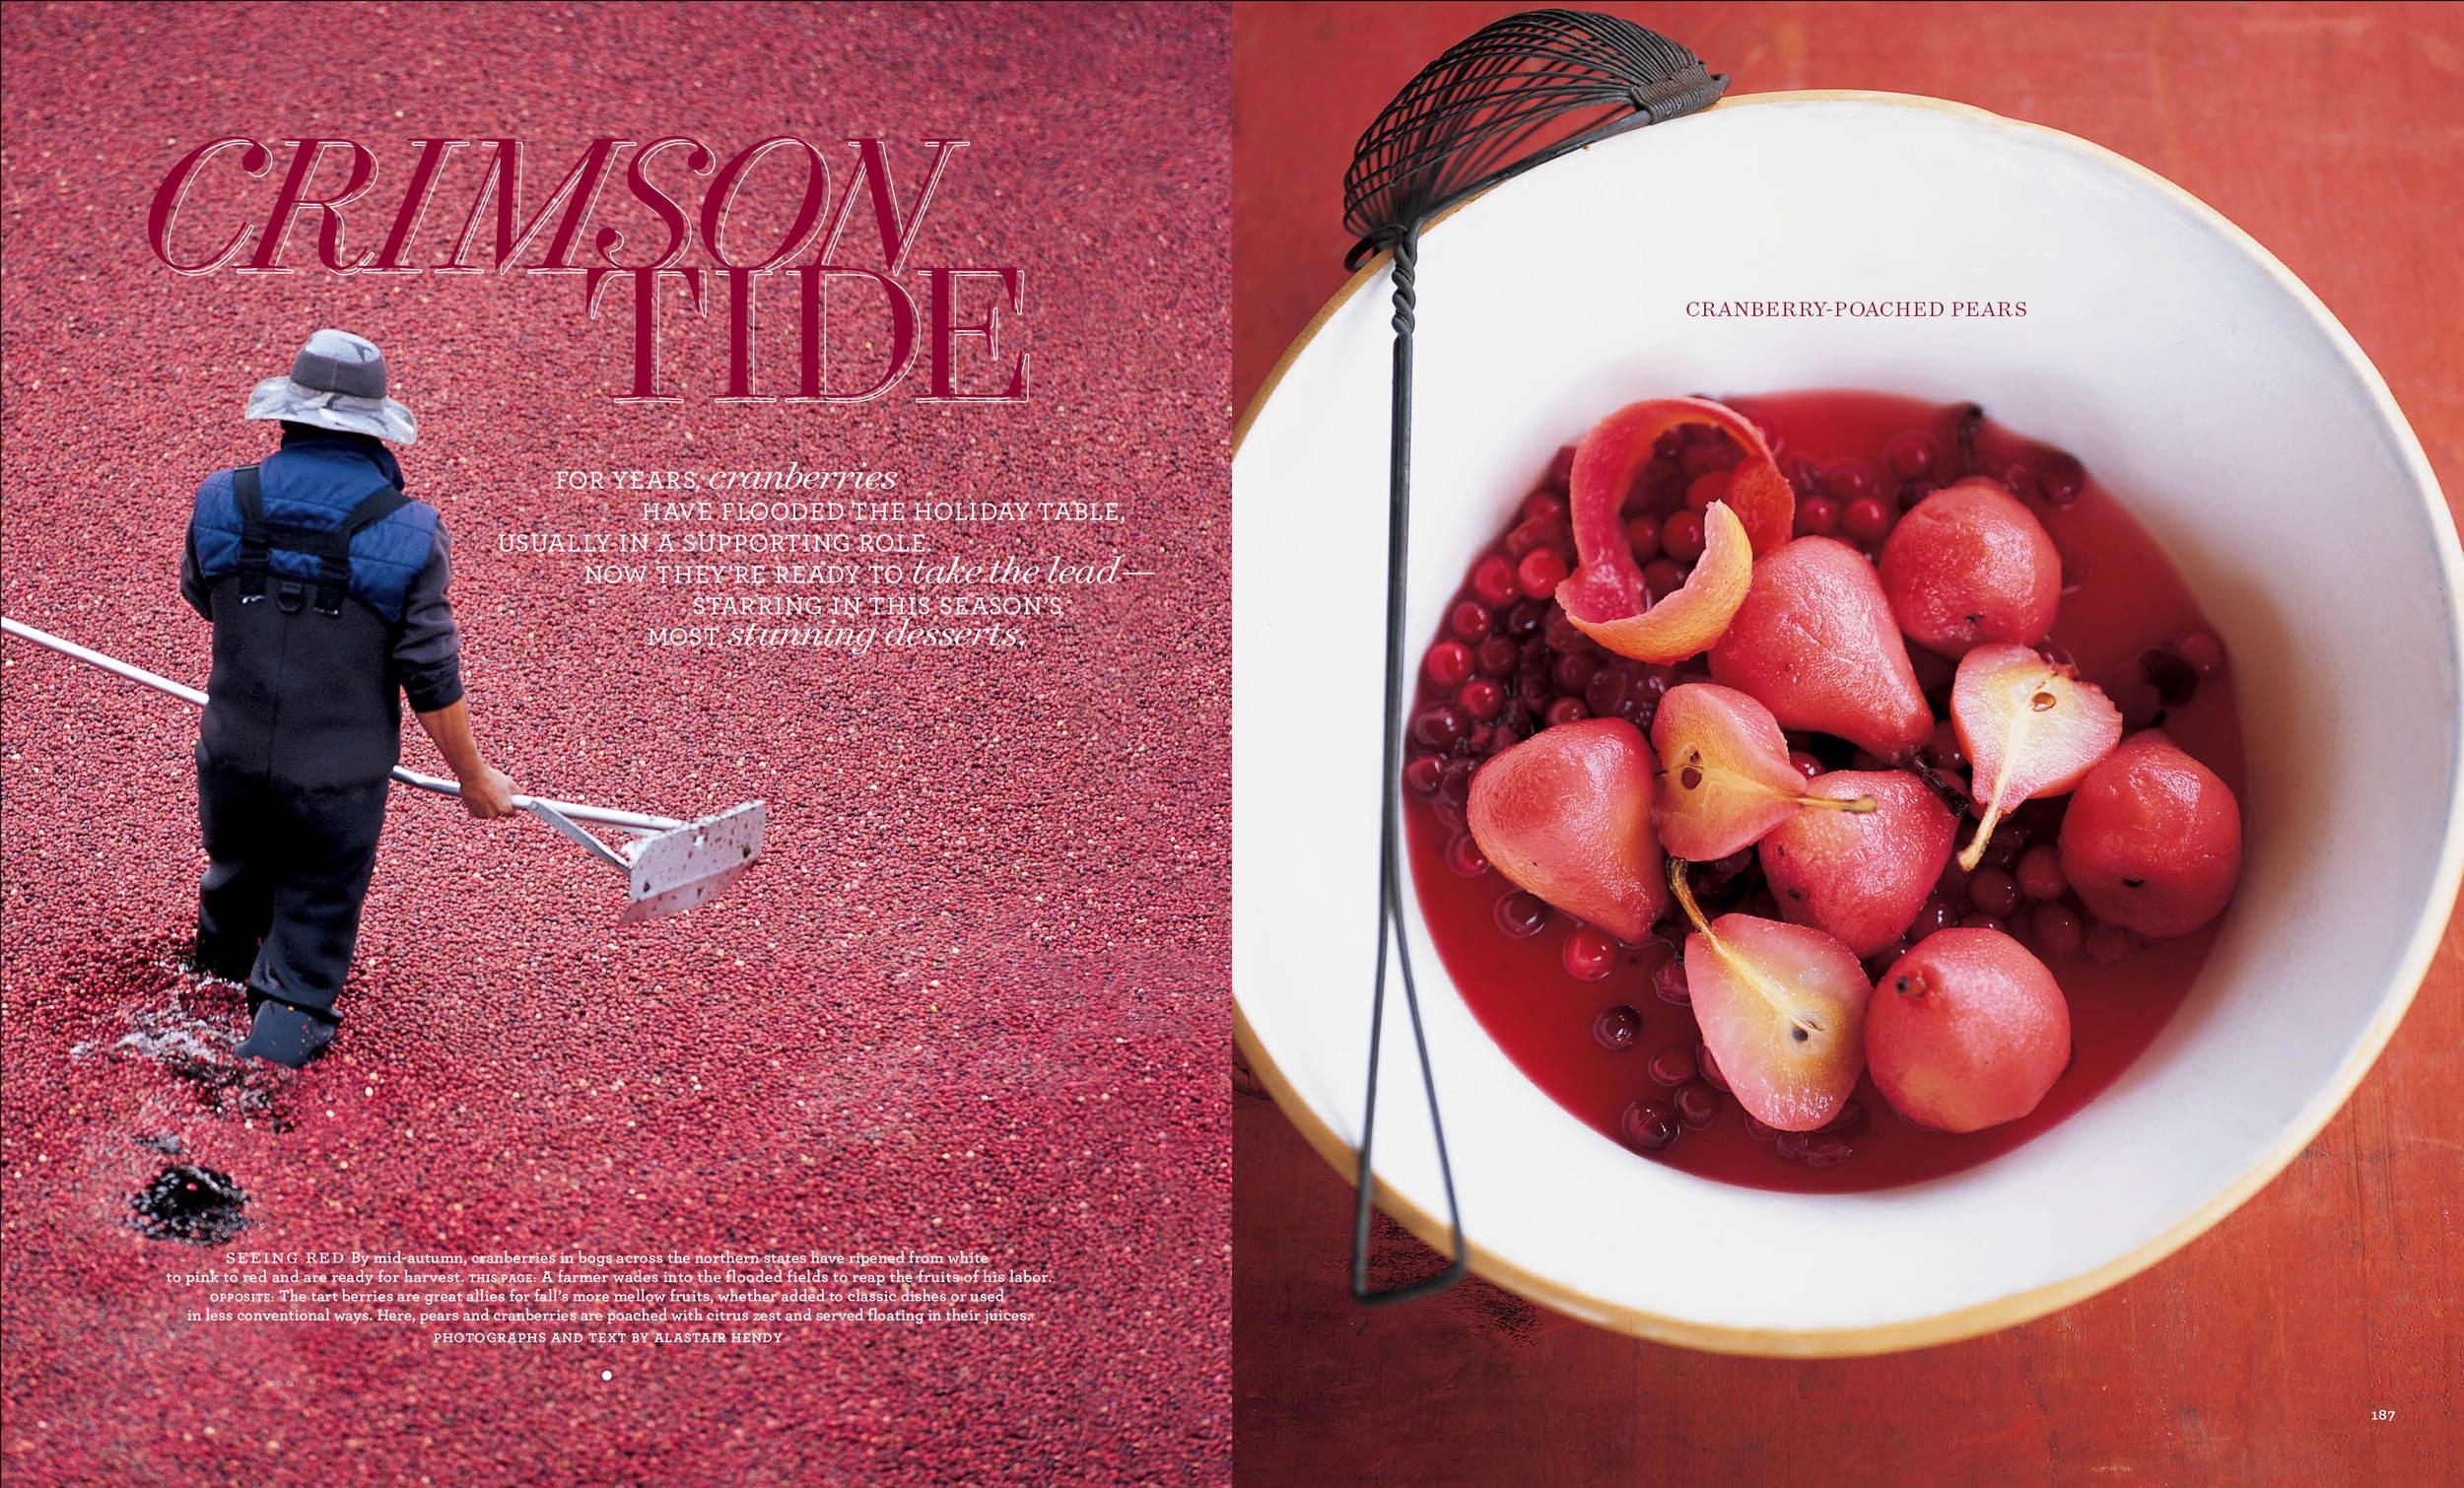 Cranberries copy.jpg